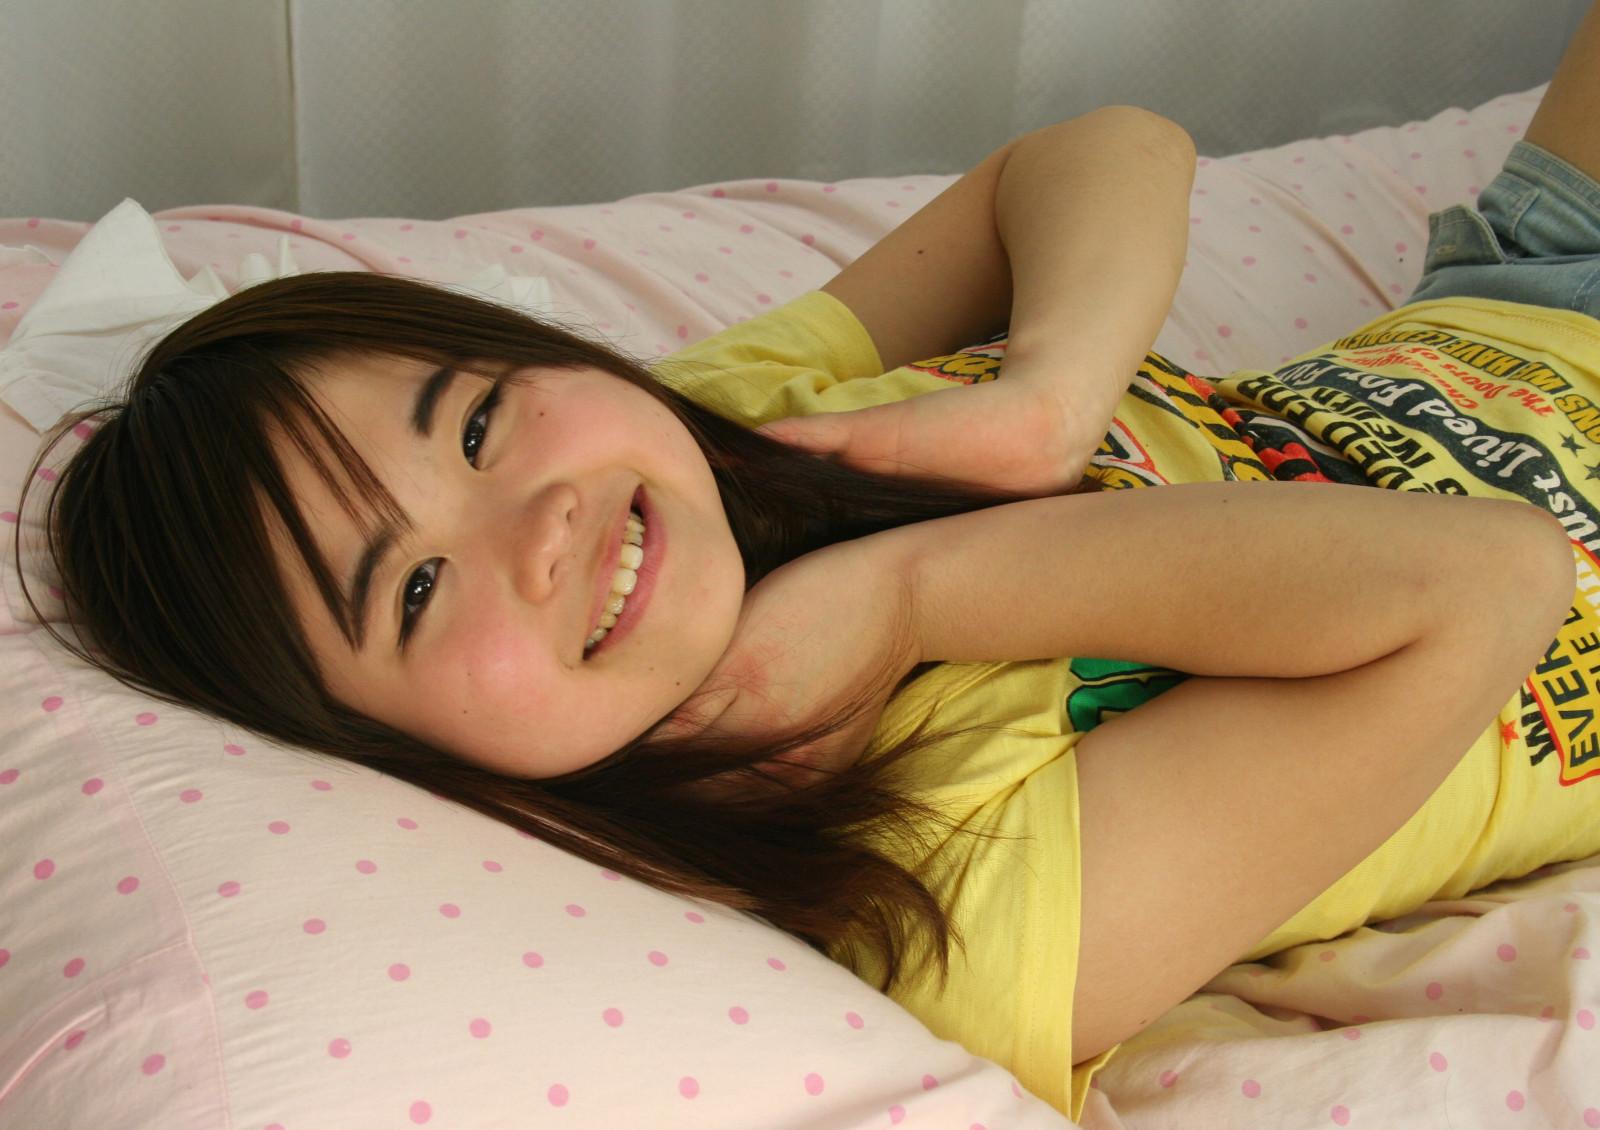 Wallpaper  Face, Model, Hands, Long Hair, Smiling, Shirt -4919